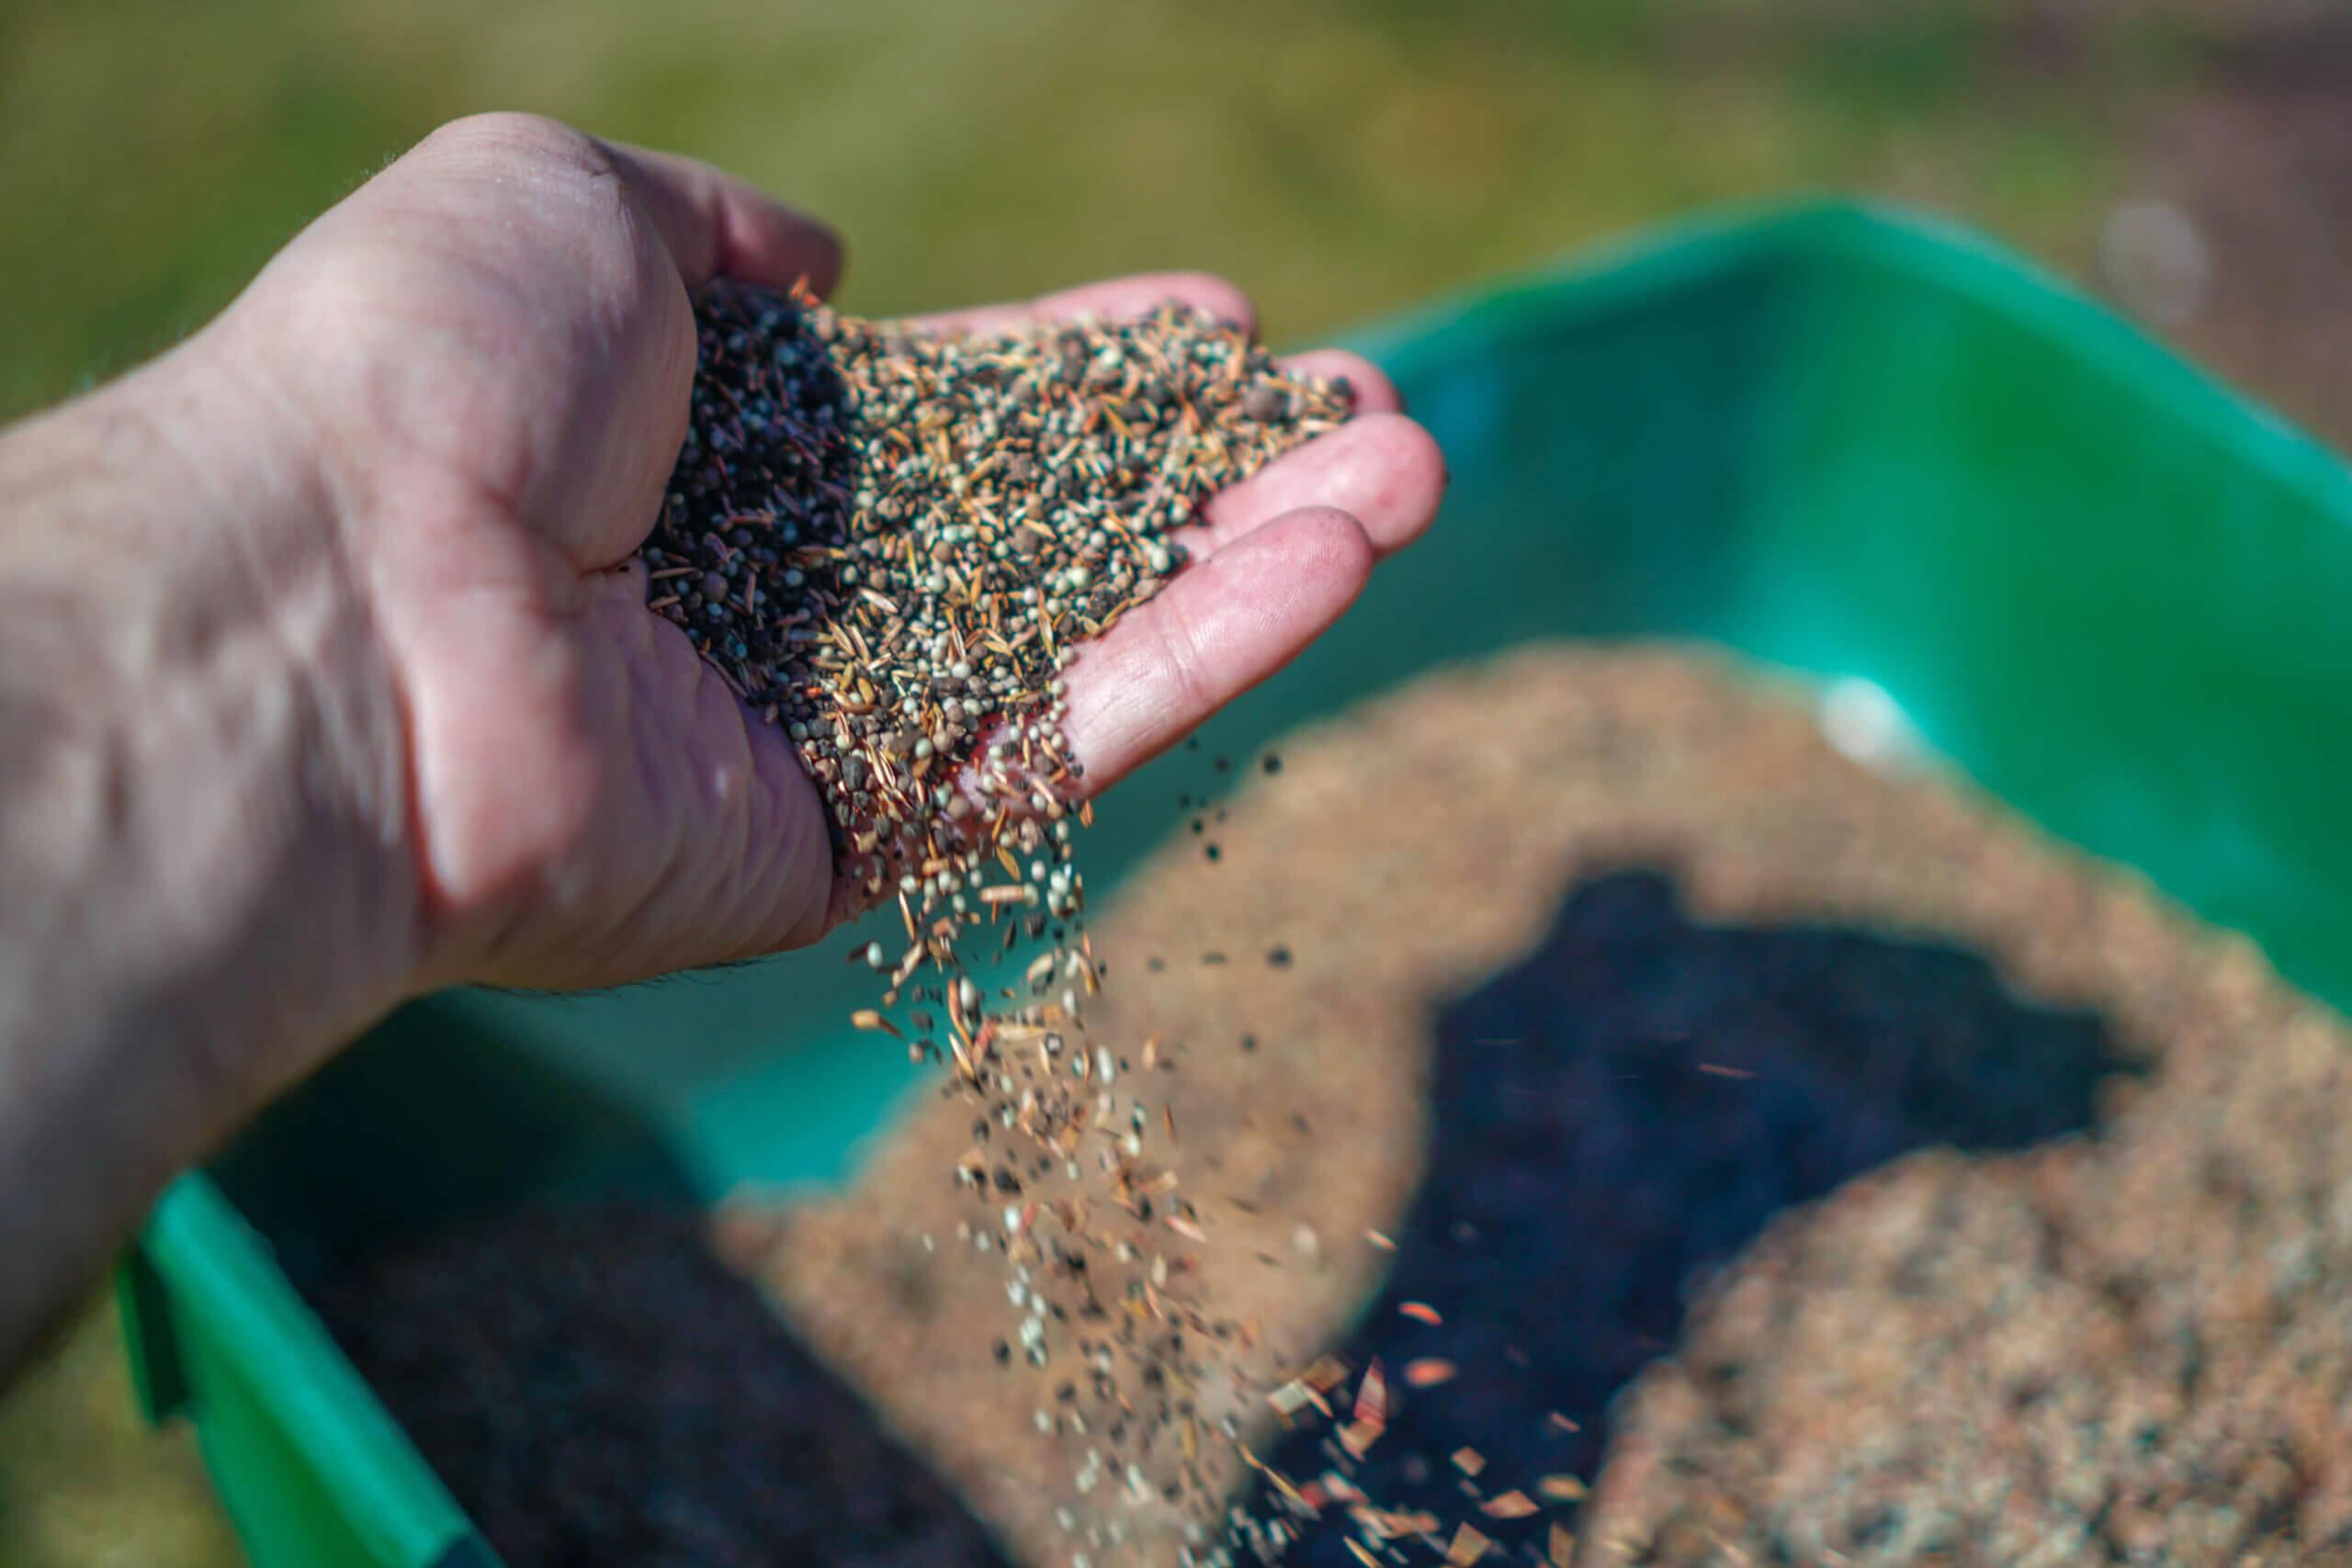 Fertilizer. Fertilize lawn. hands of man and woman holding lawn seeds